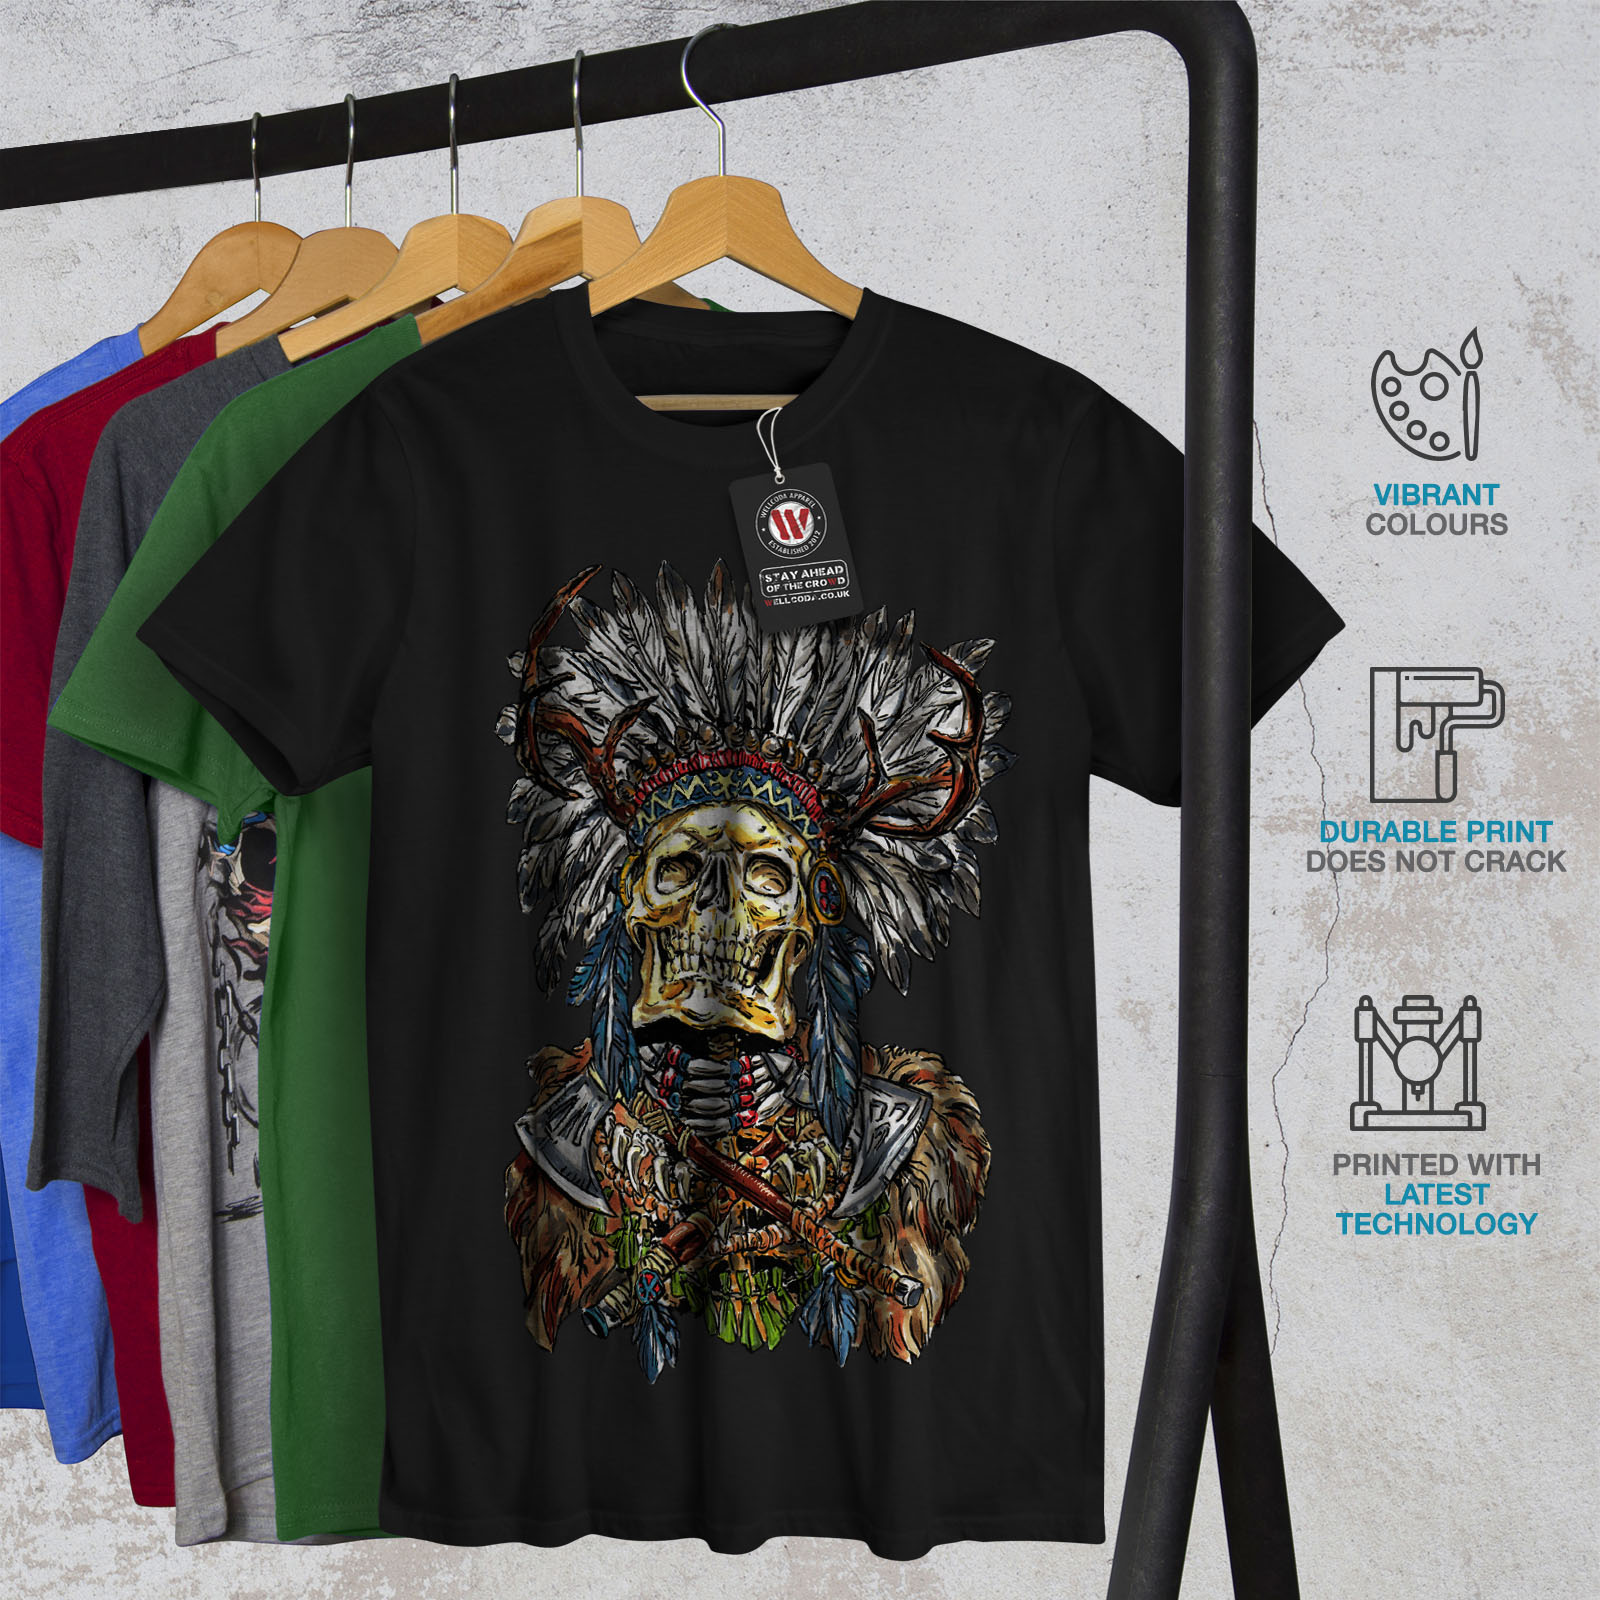 Wellcoda Native Metal Badass Mens T-shirt, Native Graphic ...